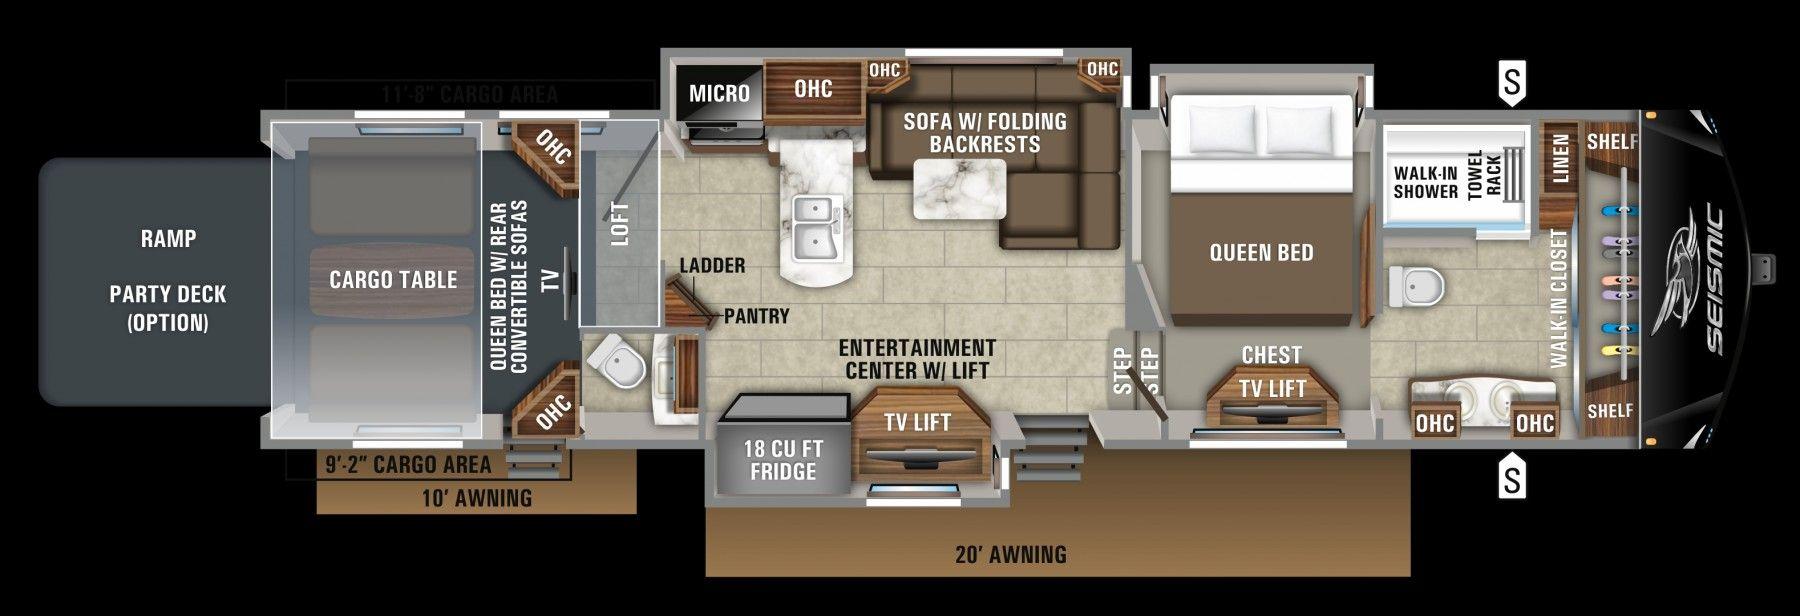 2019 Jayco Seismic 4250 Forward Bathroom Rv Floor Plans Floor Plans Toy Hauler